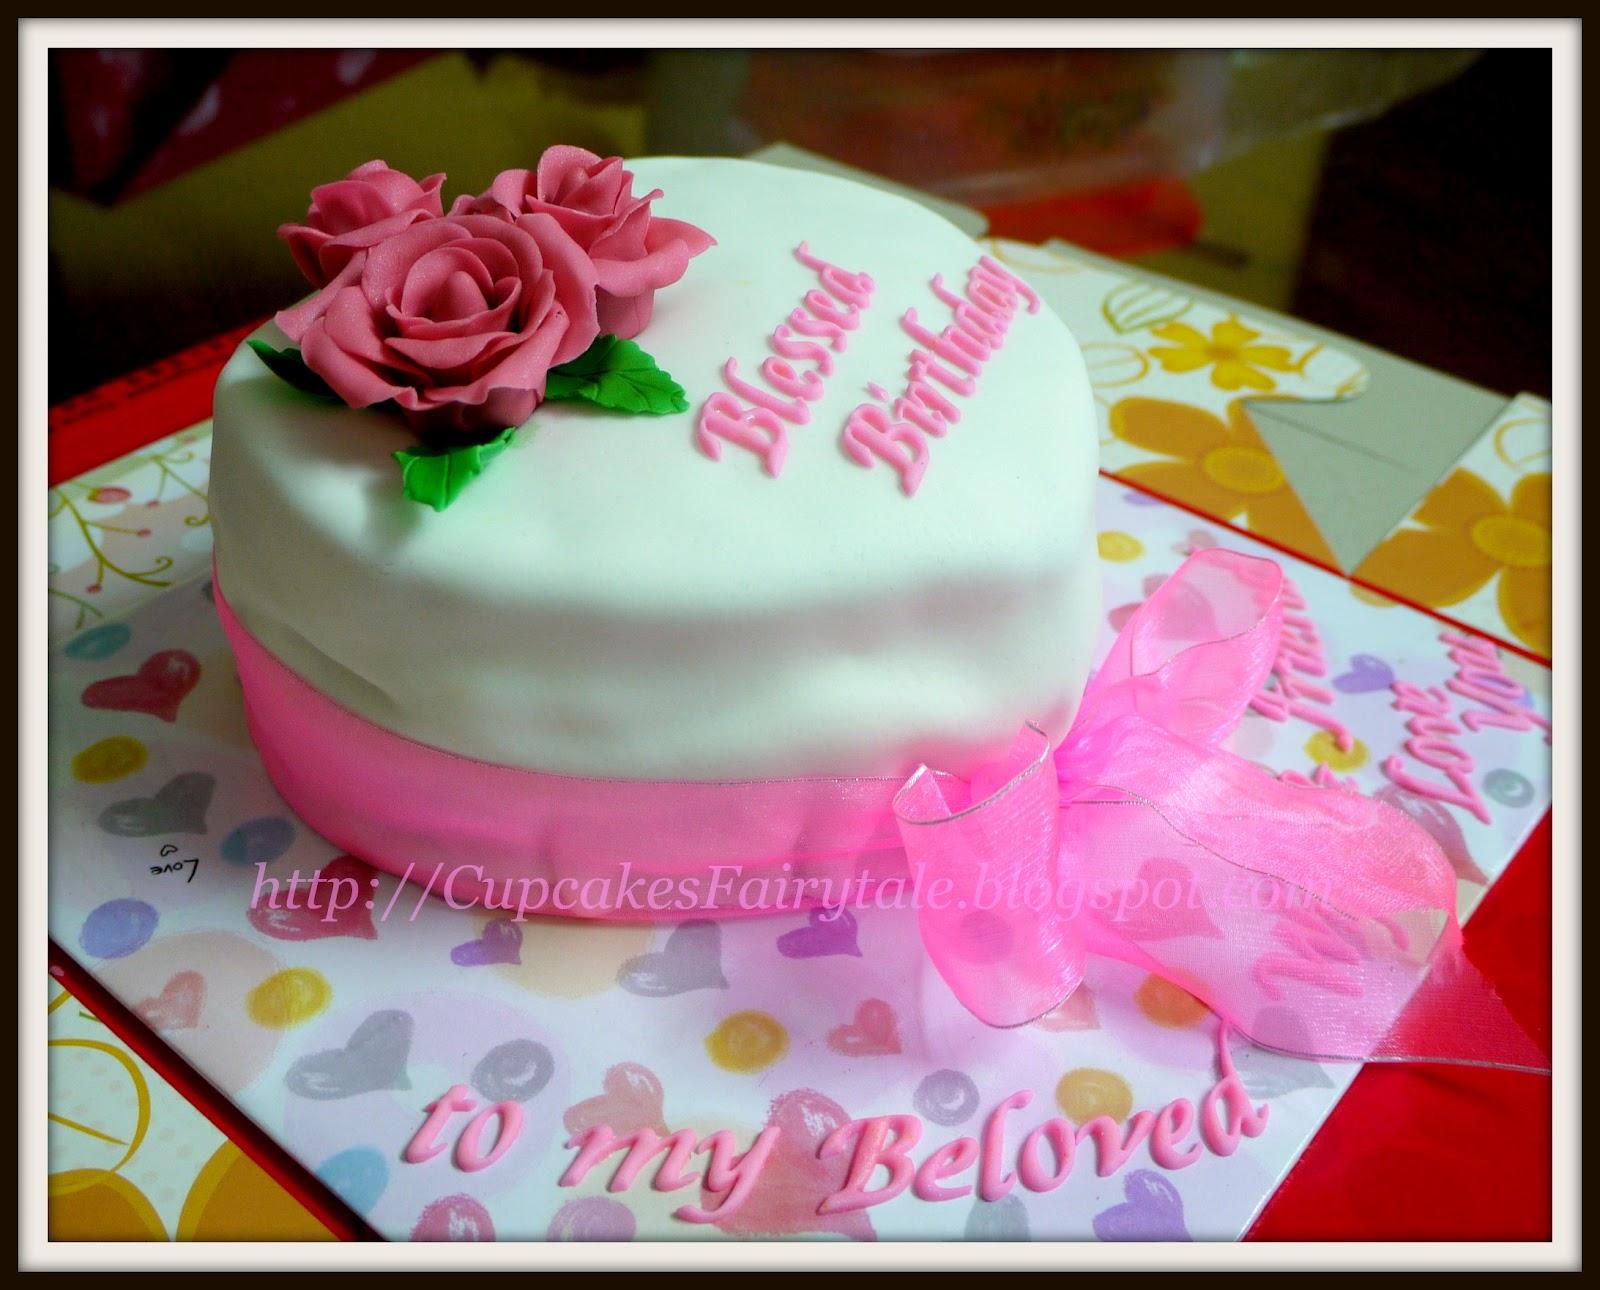 Happy Birthday Husband Romantic ~ Romantic birthday cake for hubby image inspiration of cake and